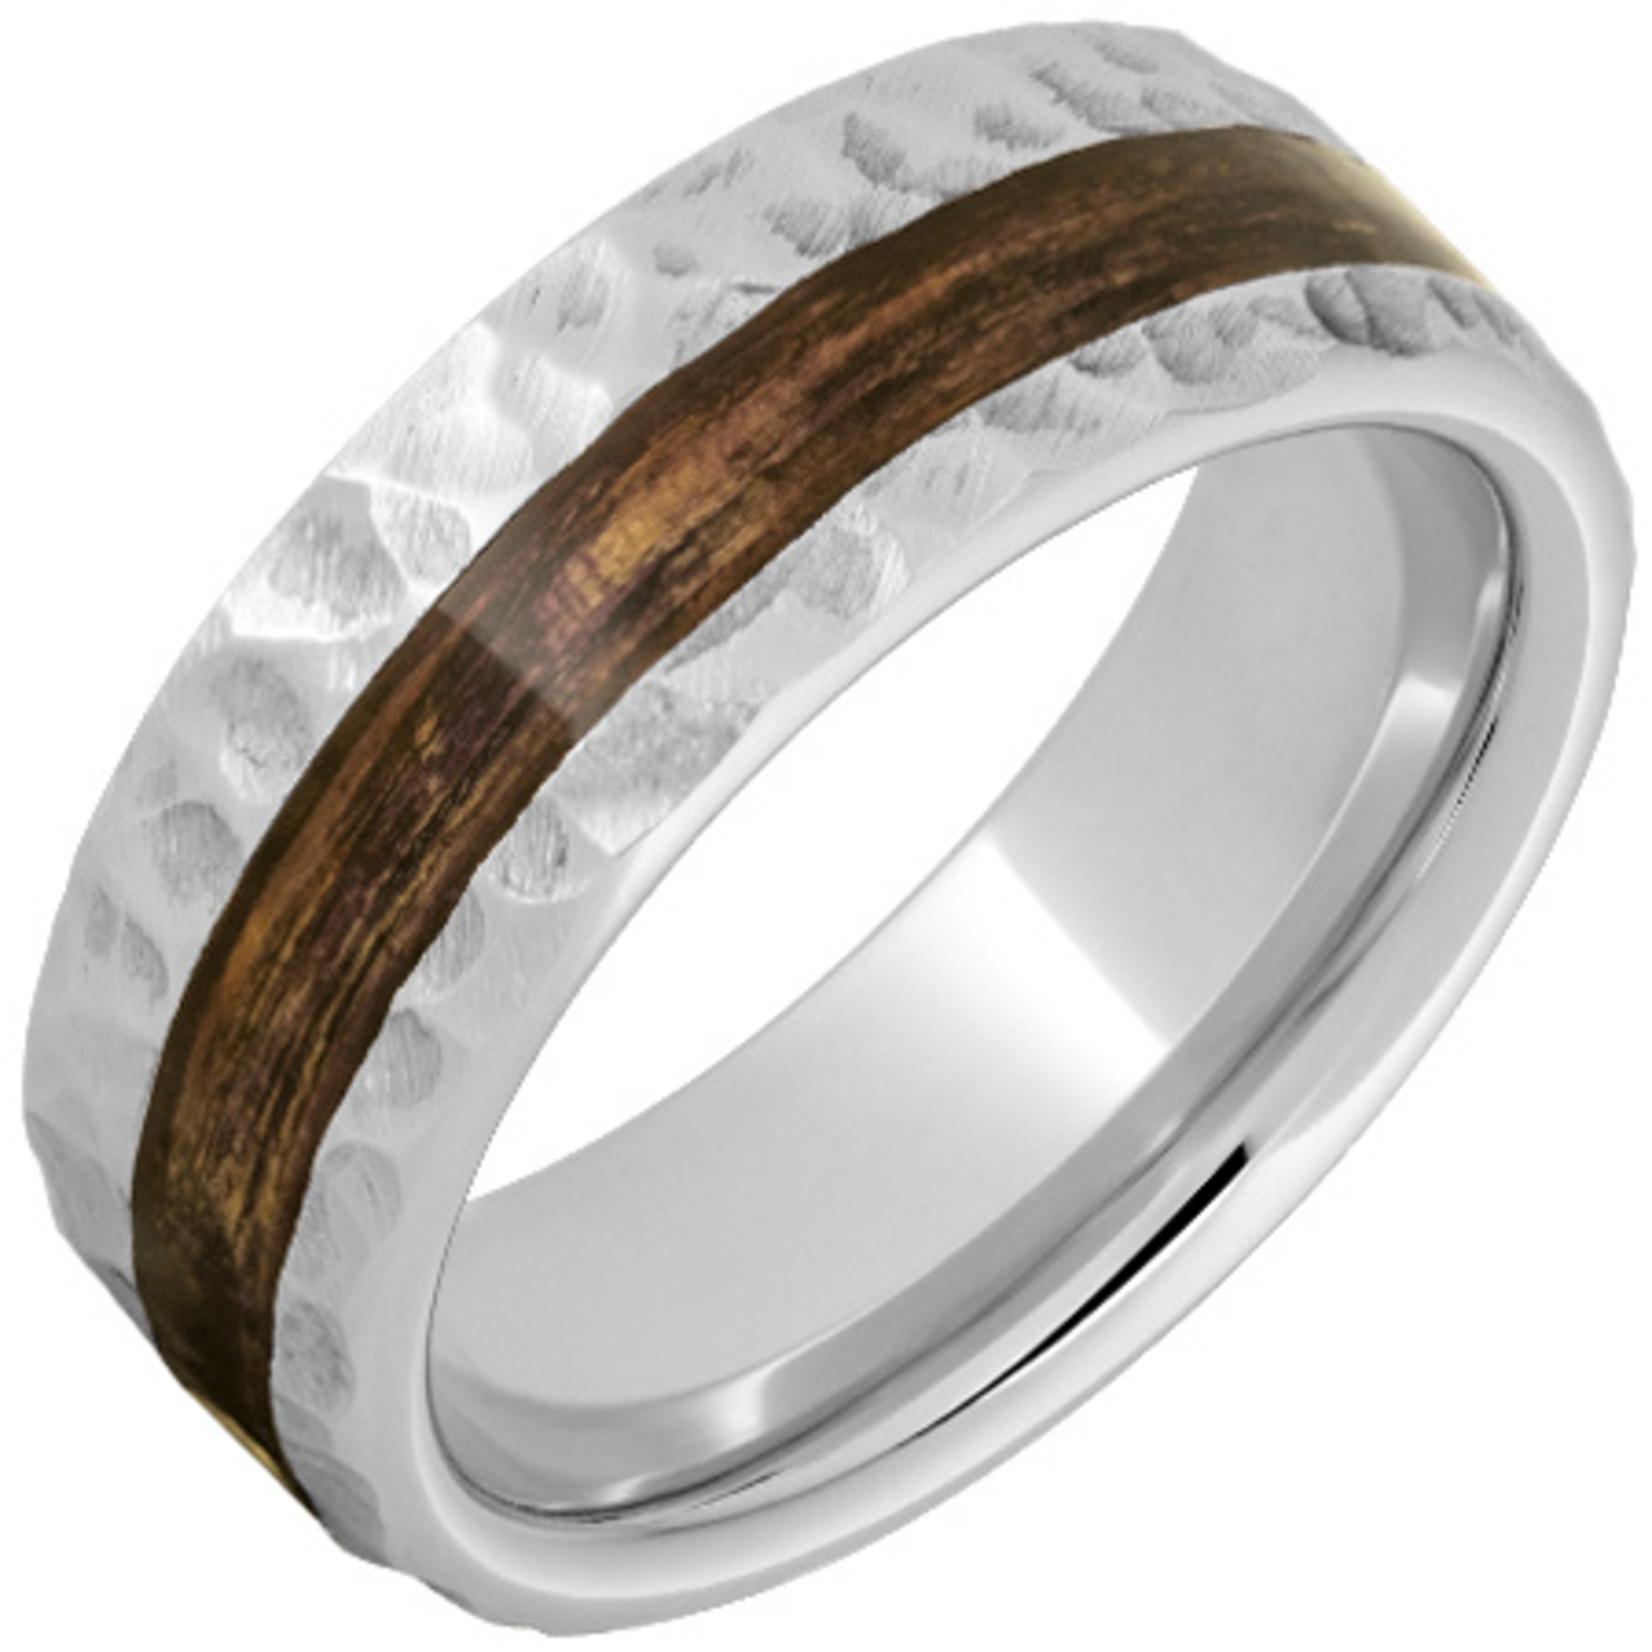 Serinium Wedding Bands Serinium® Pipe Cut Band with Off-Center Bourbon Barrel Aged™ Inlay and Moon Finish